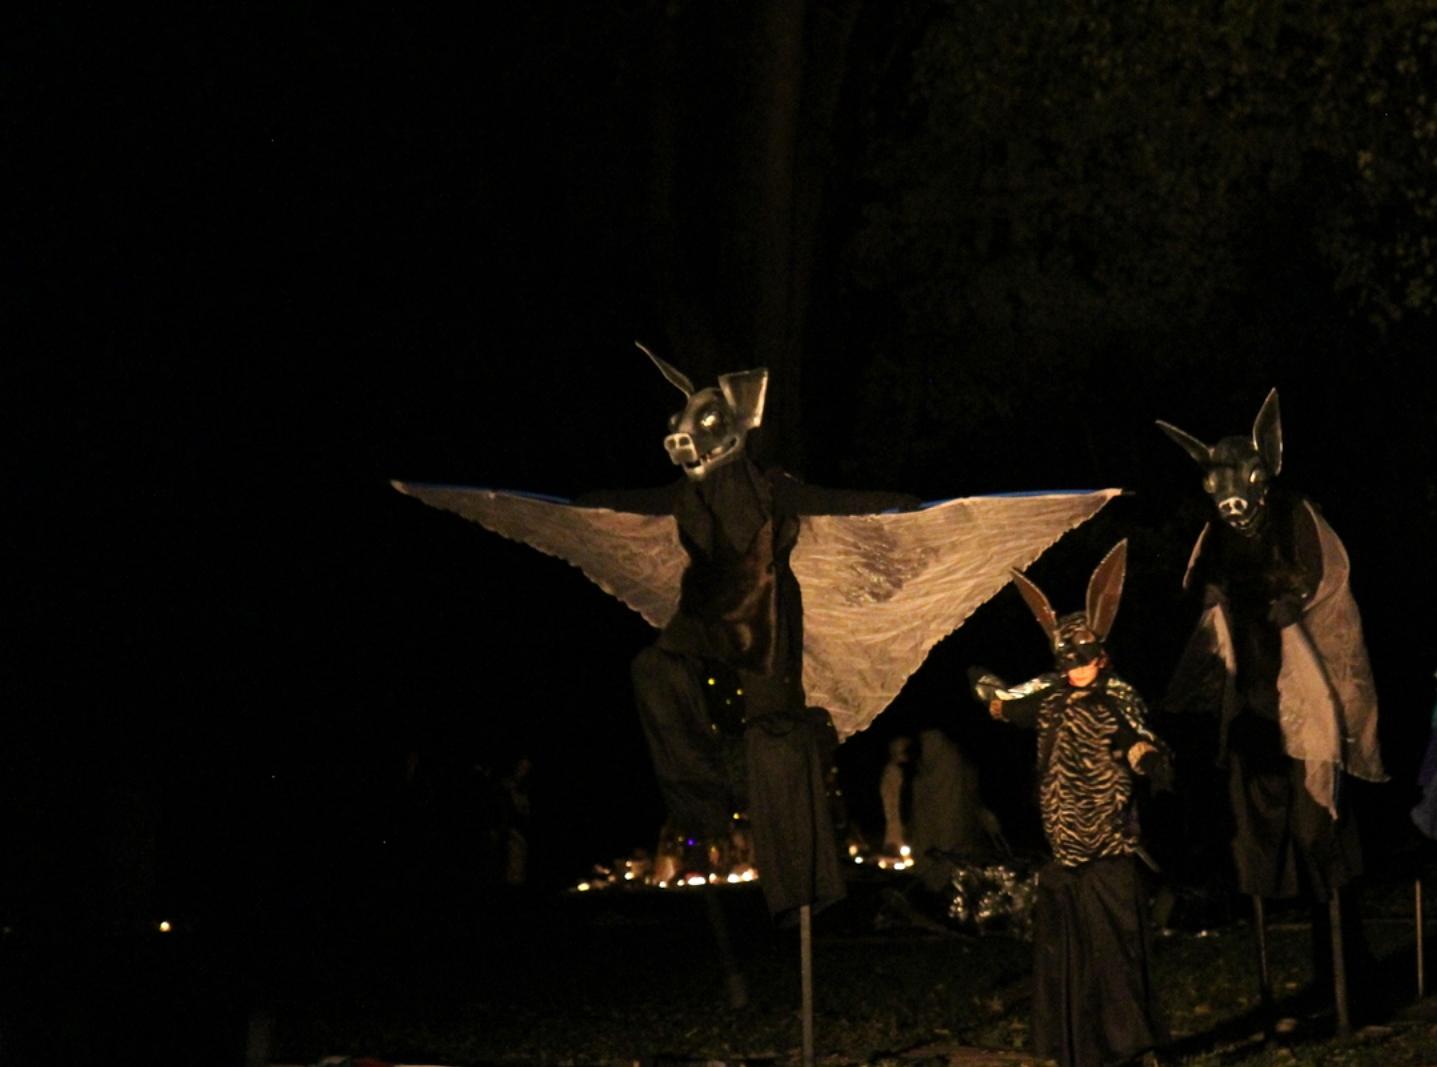 Stilted Bat Puppets